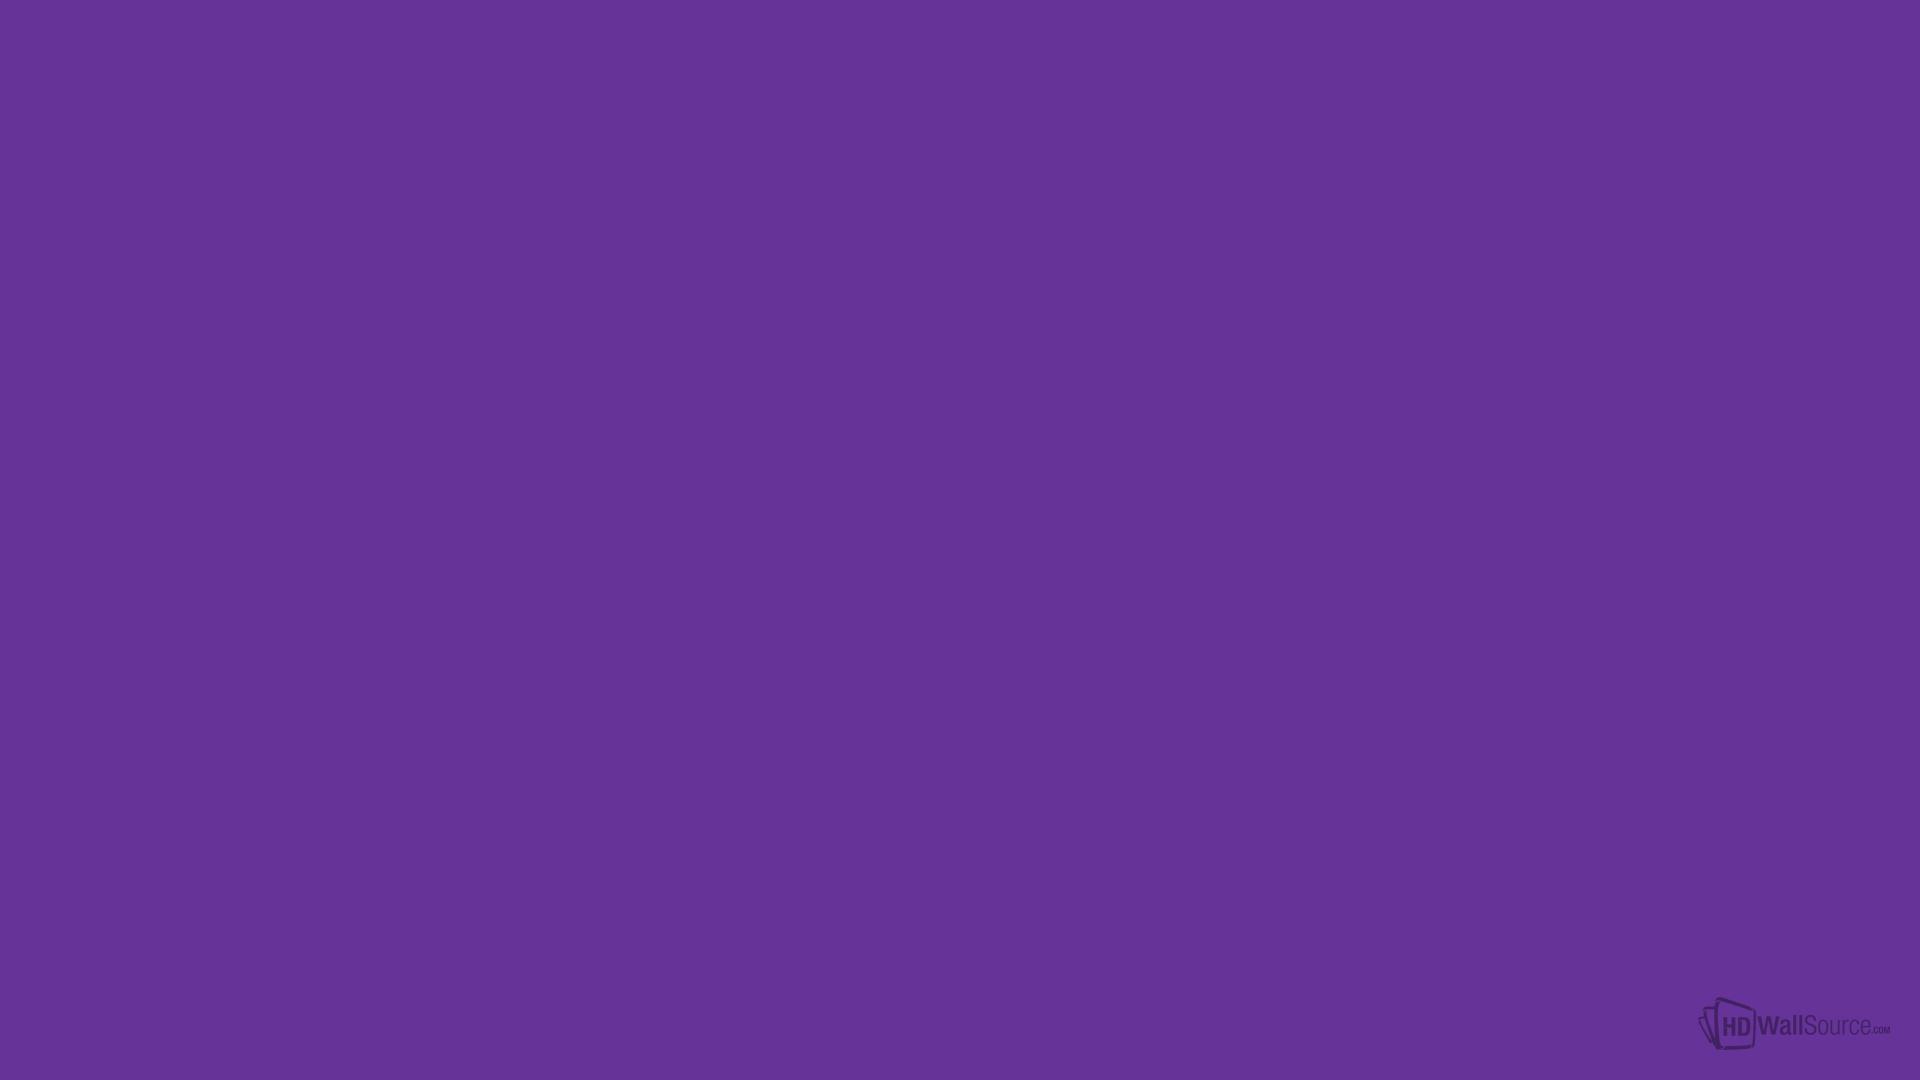 663399 wallpaper 71046